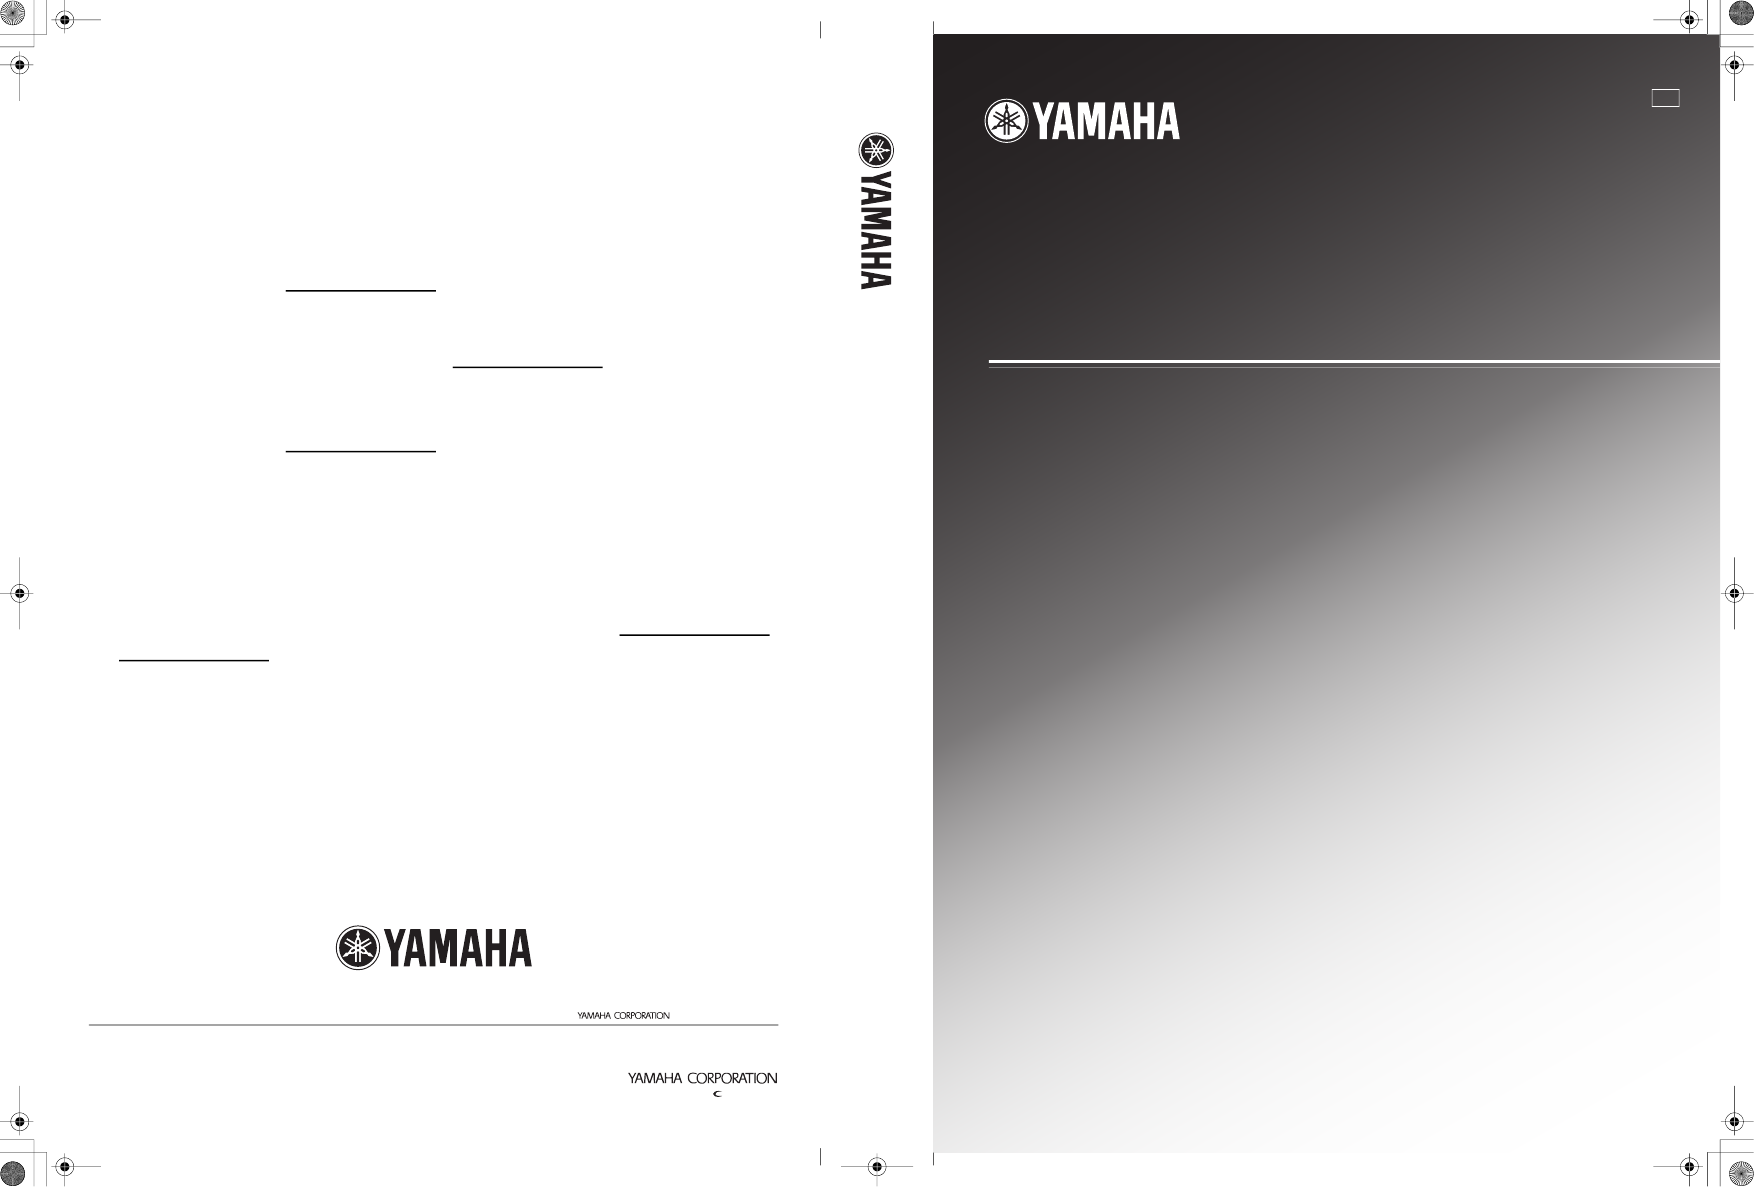 ymana rx v767 схема